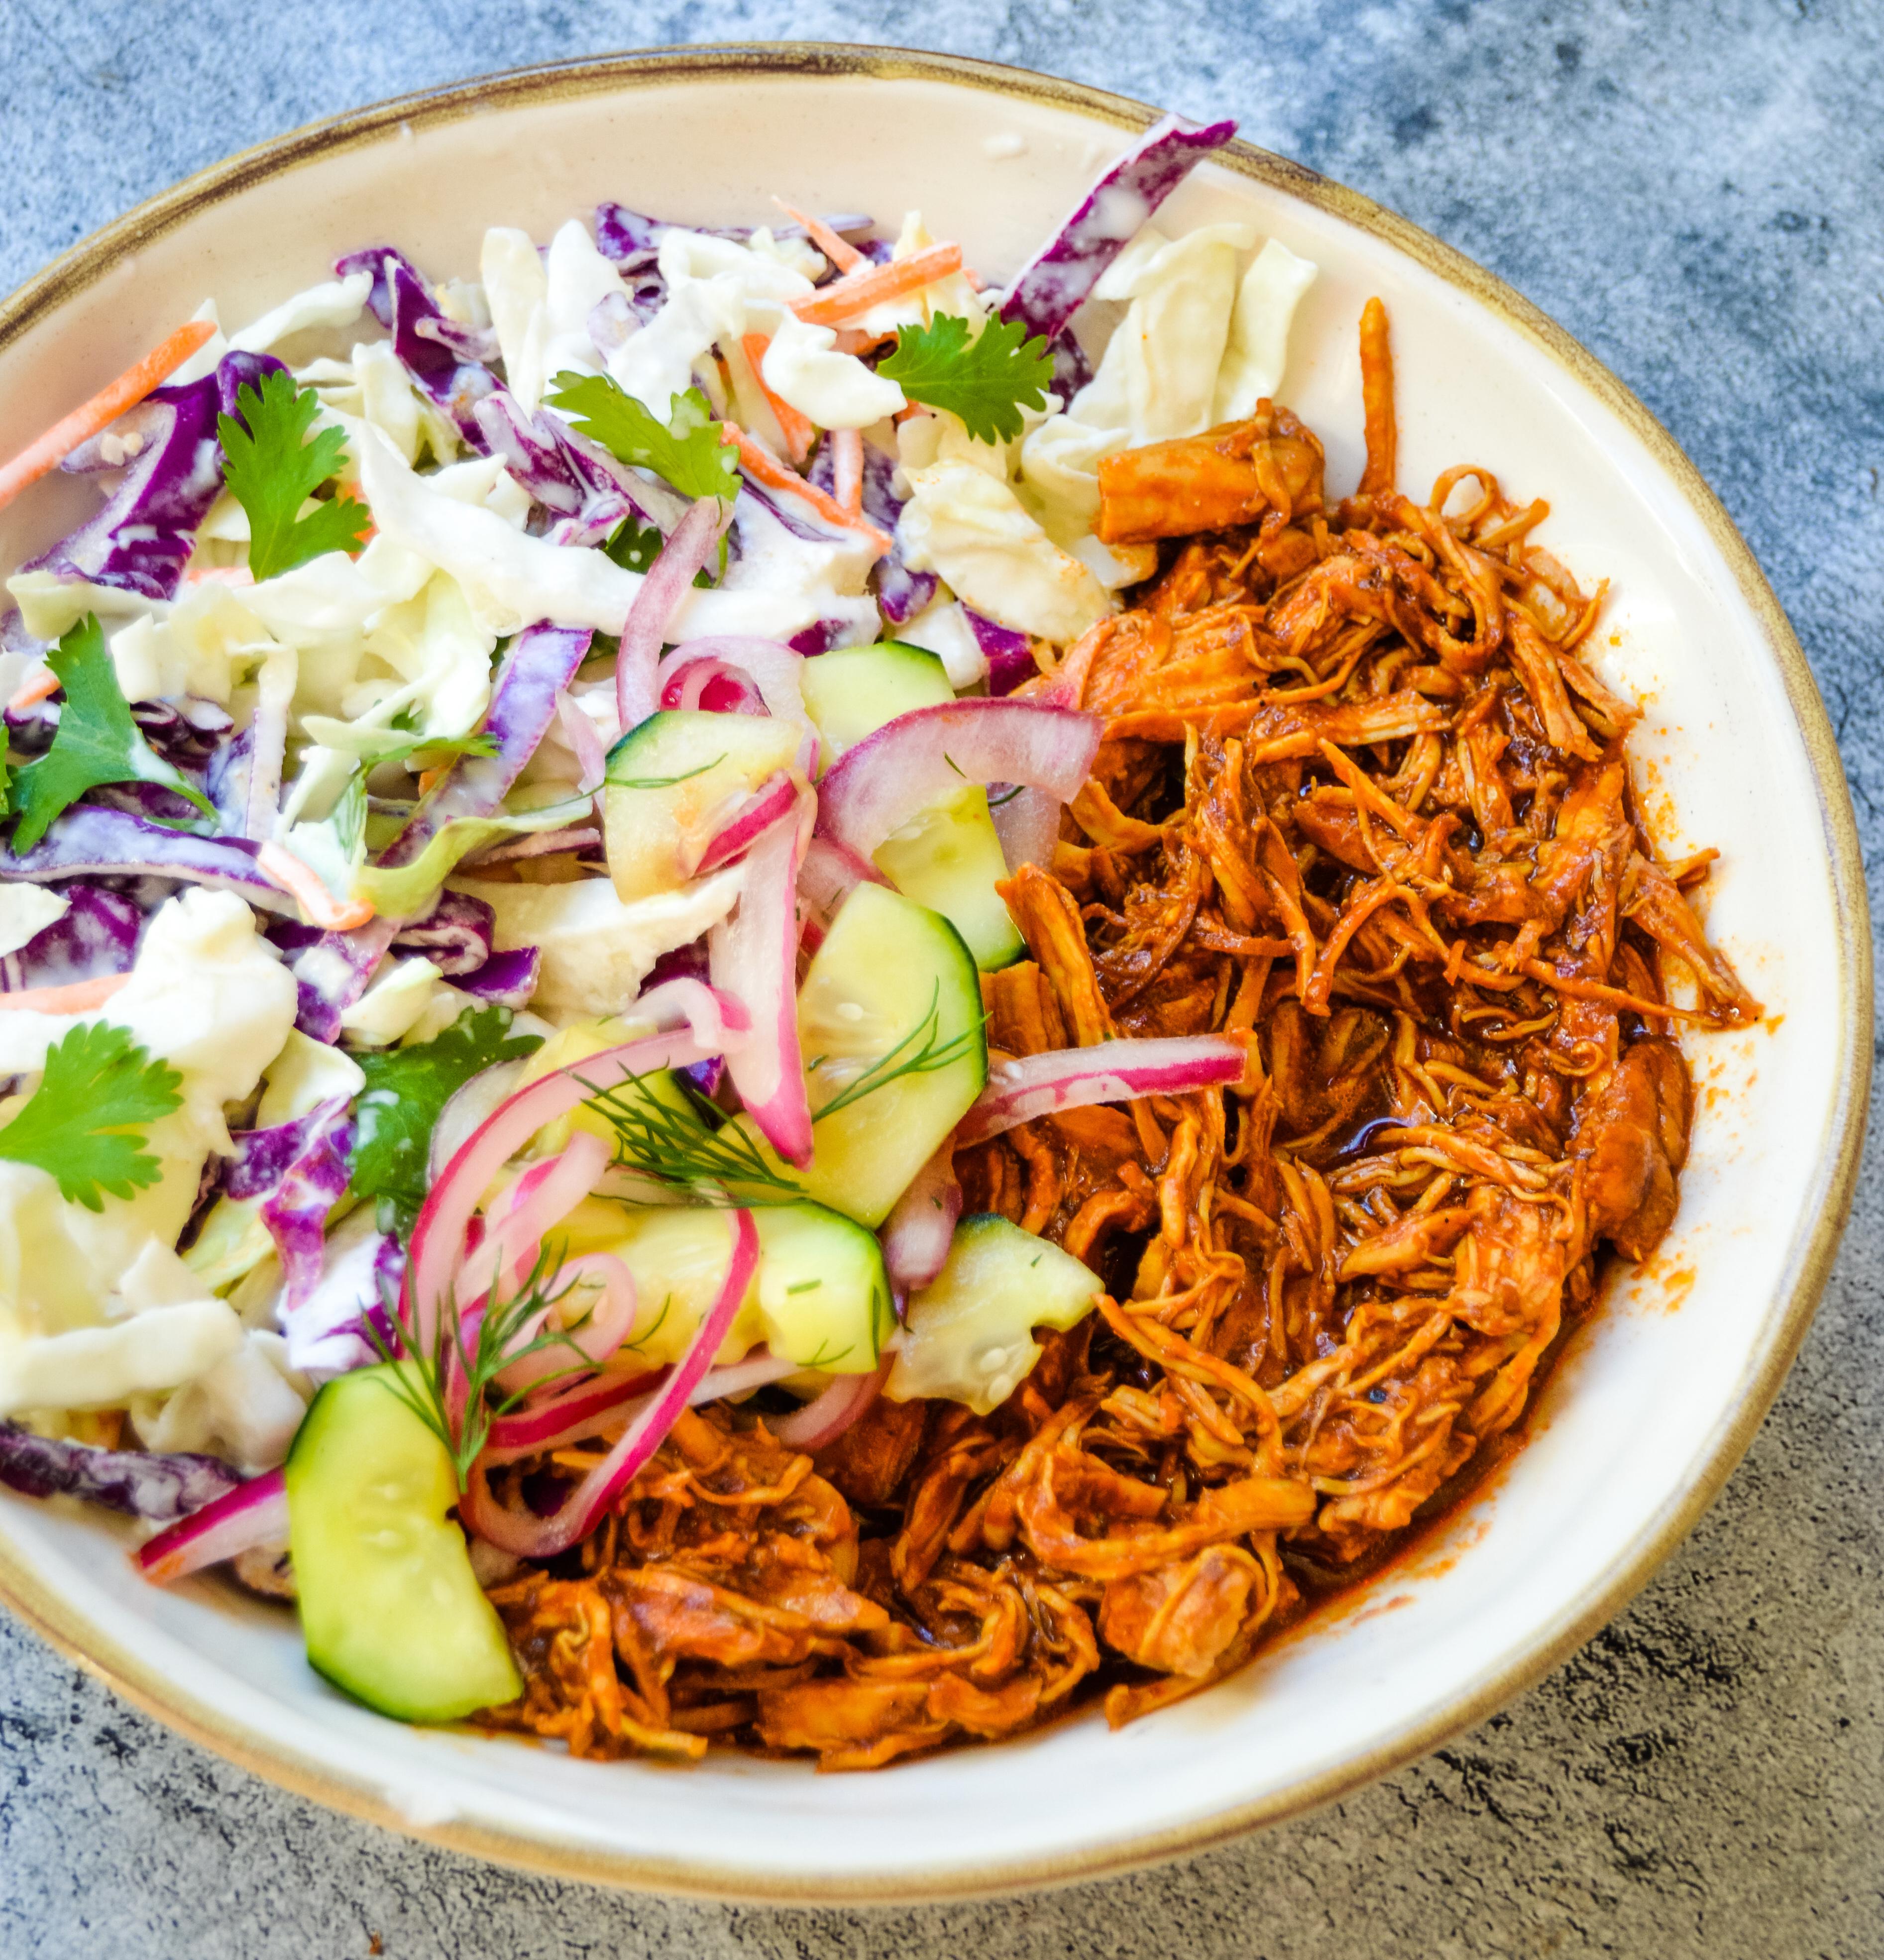 bbq chicken & coleslaw